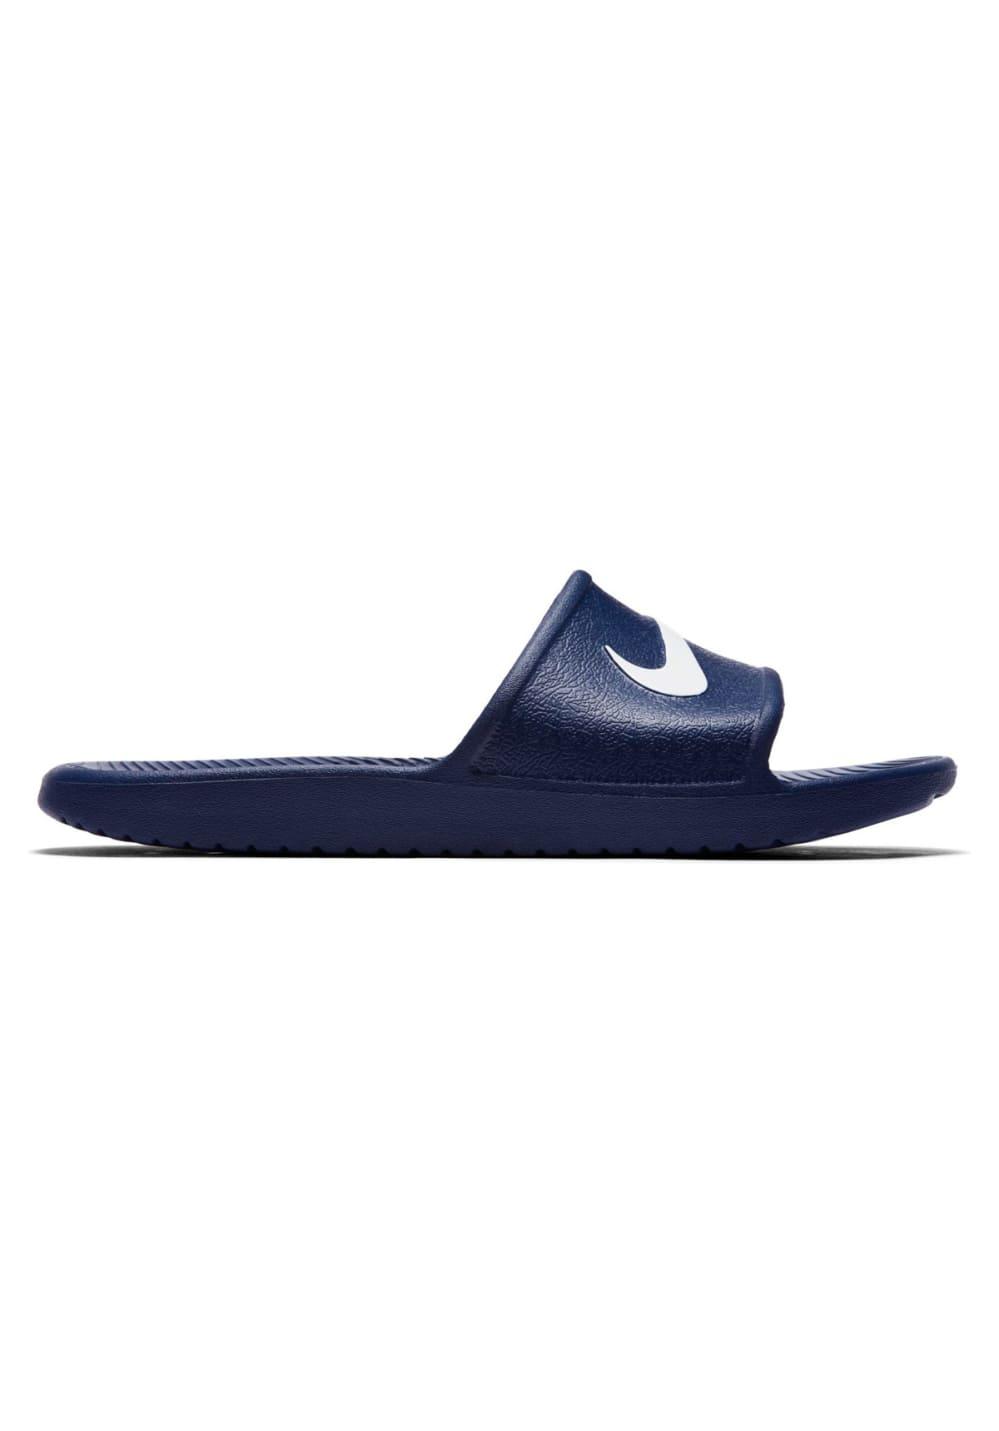 Nike Kawa Shower Slide - Badeschuhe für Herren - Weiß